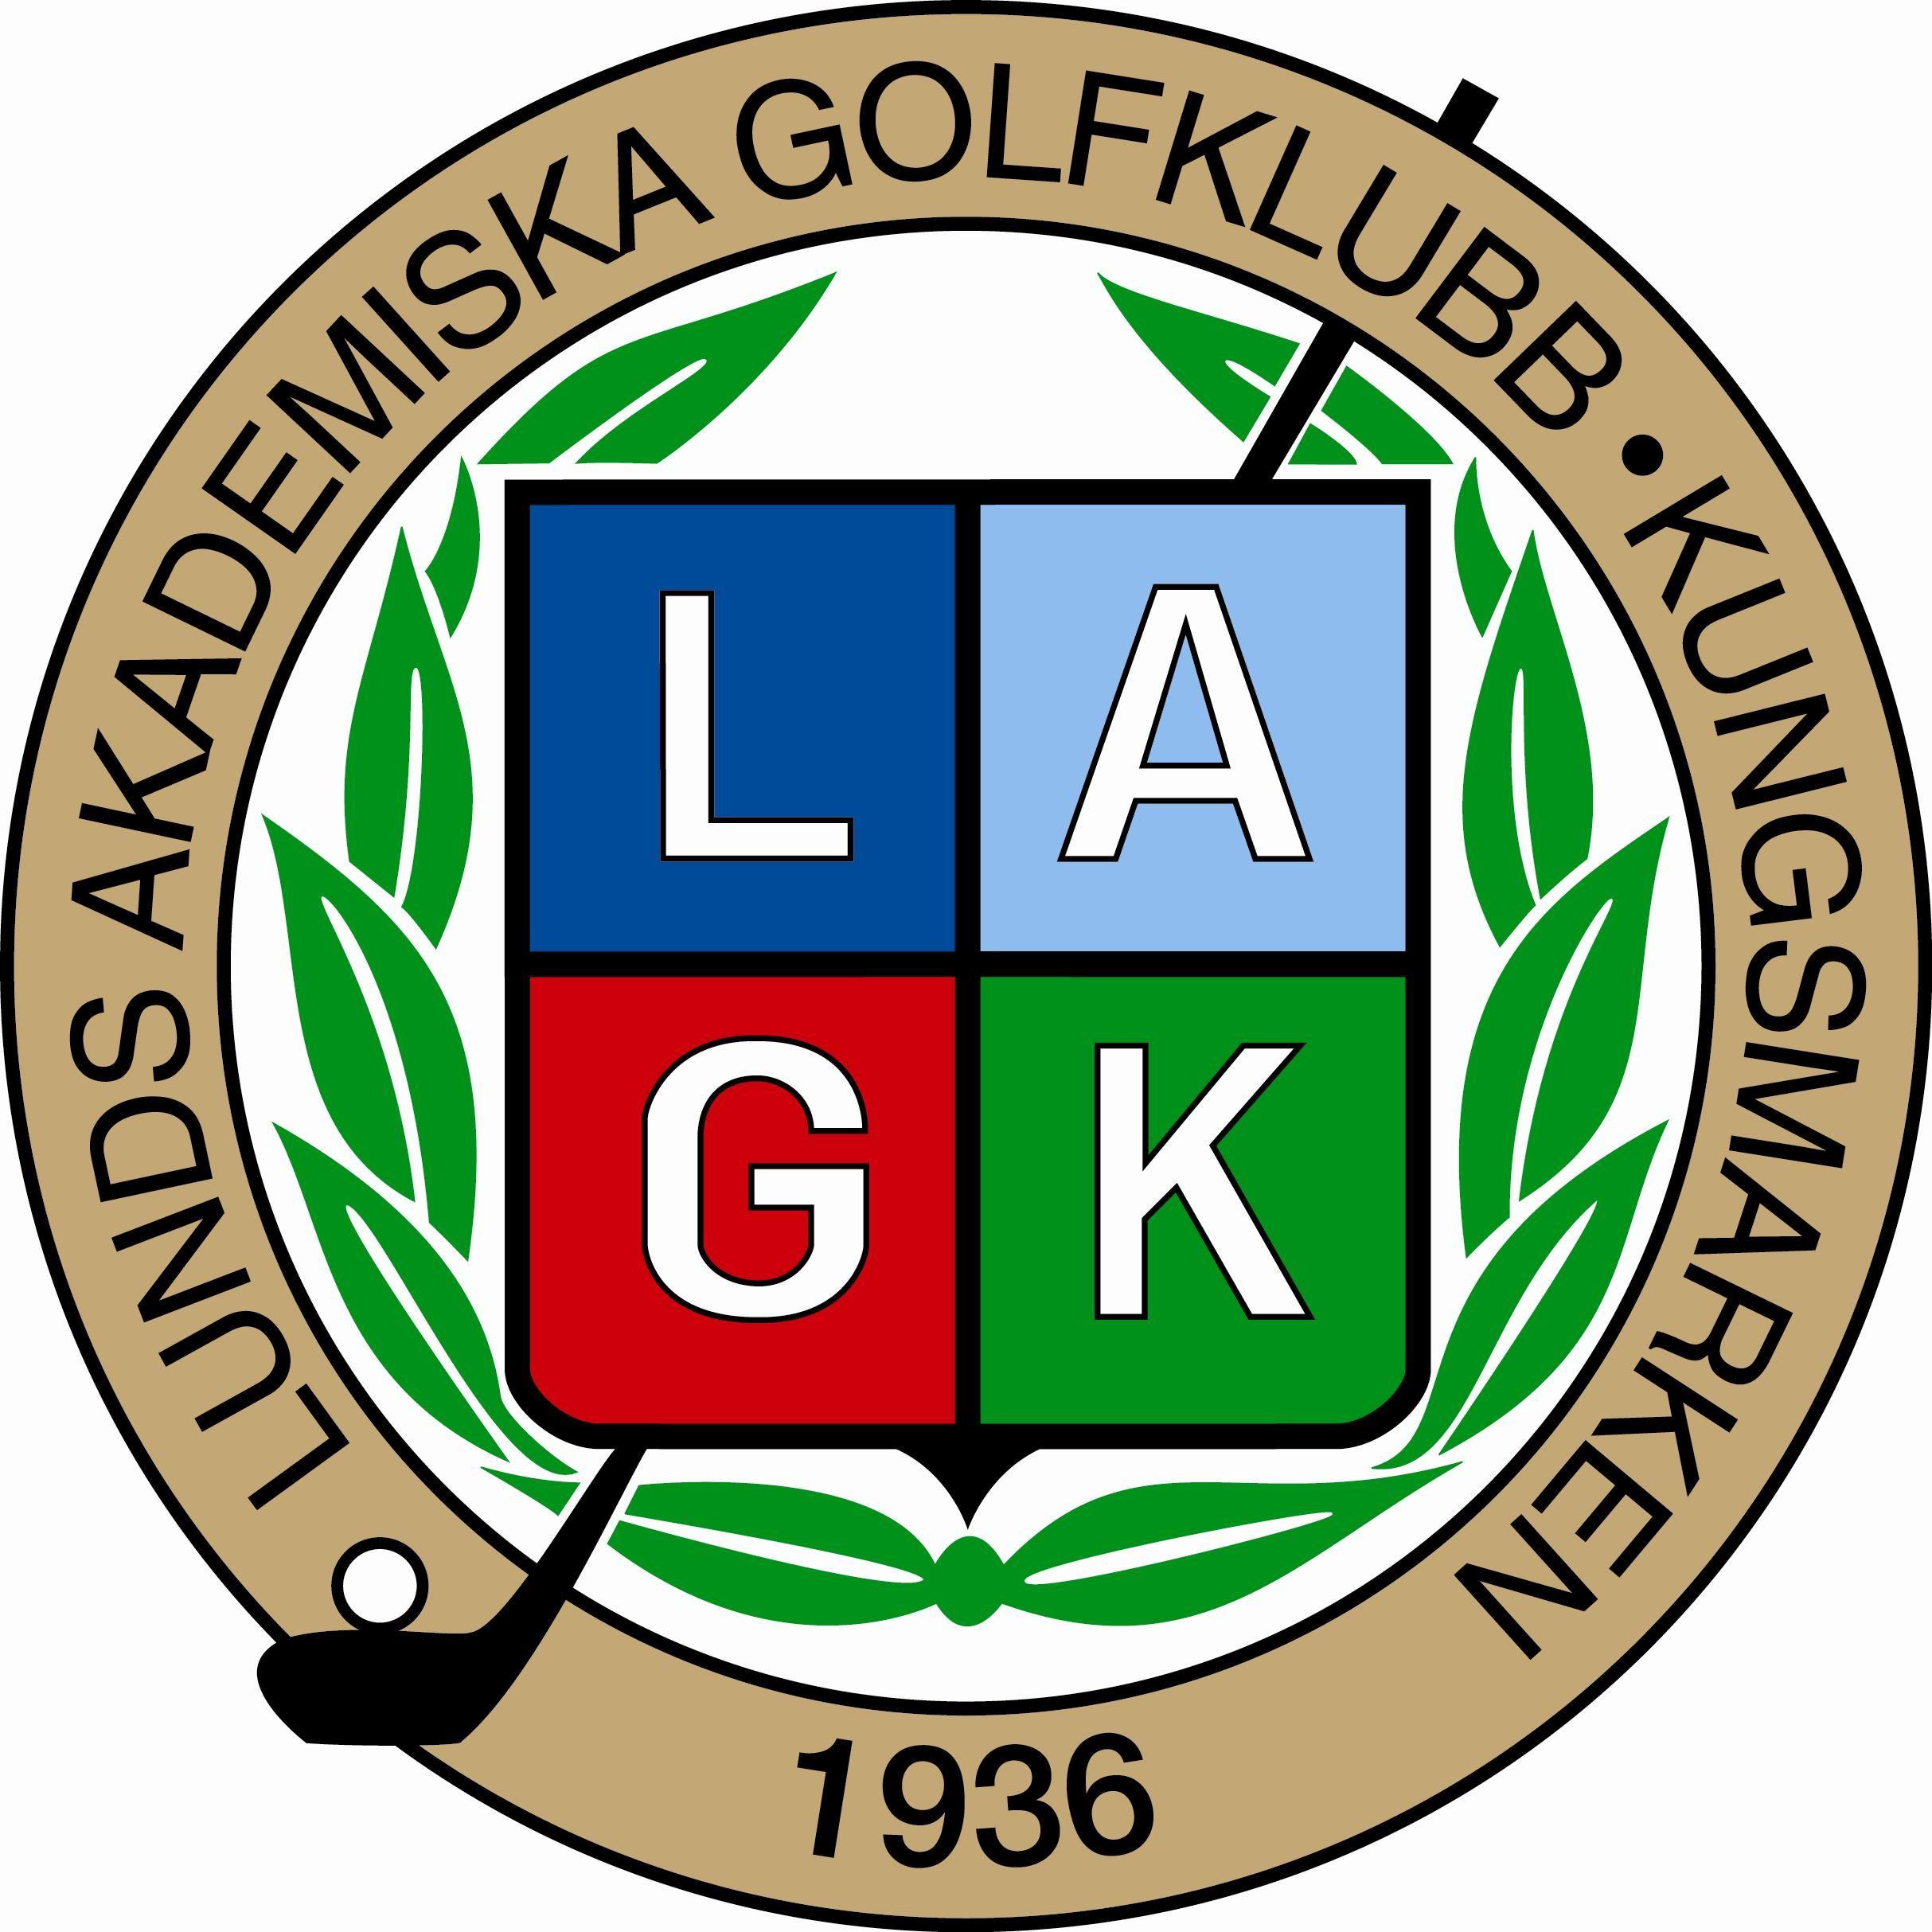 Lunds Akademiska Golfklubb,  © Lunds Akademiska Golfklubb, Lunds Akademiska Golfklubb